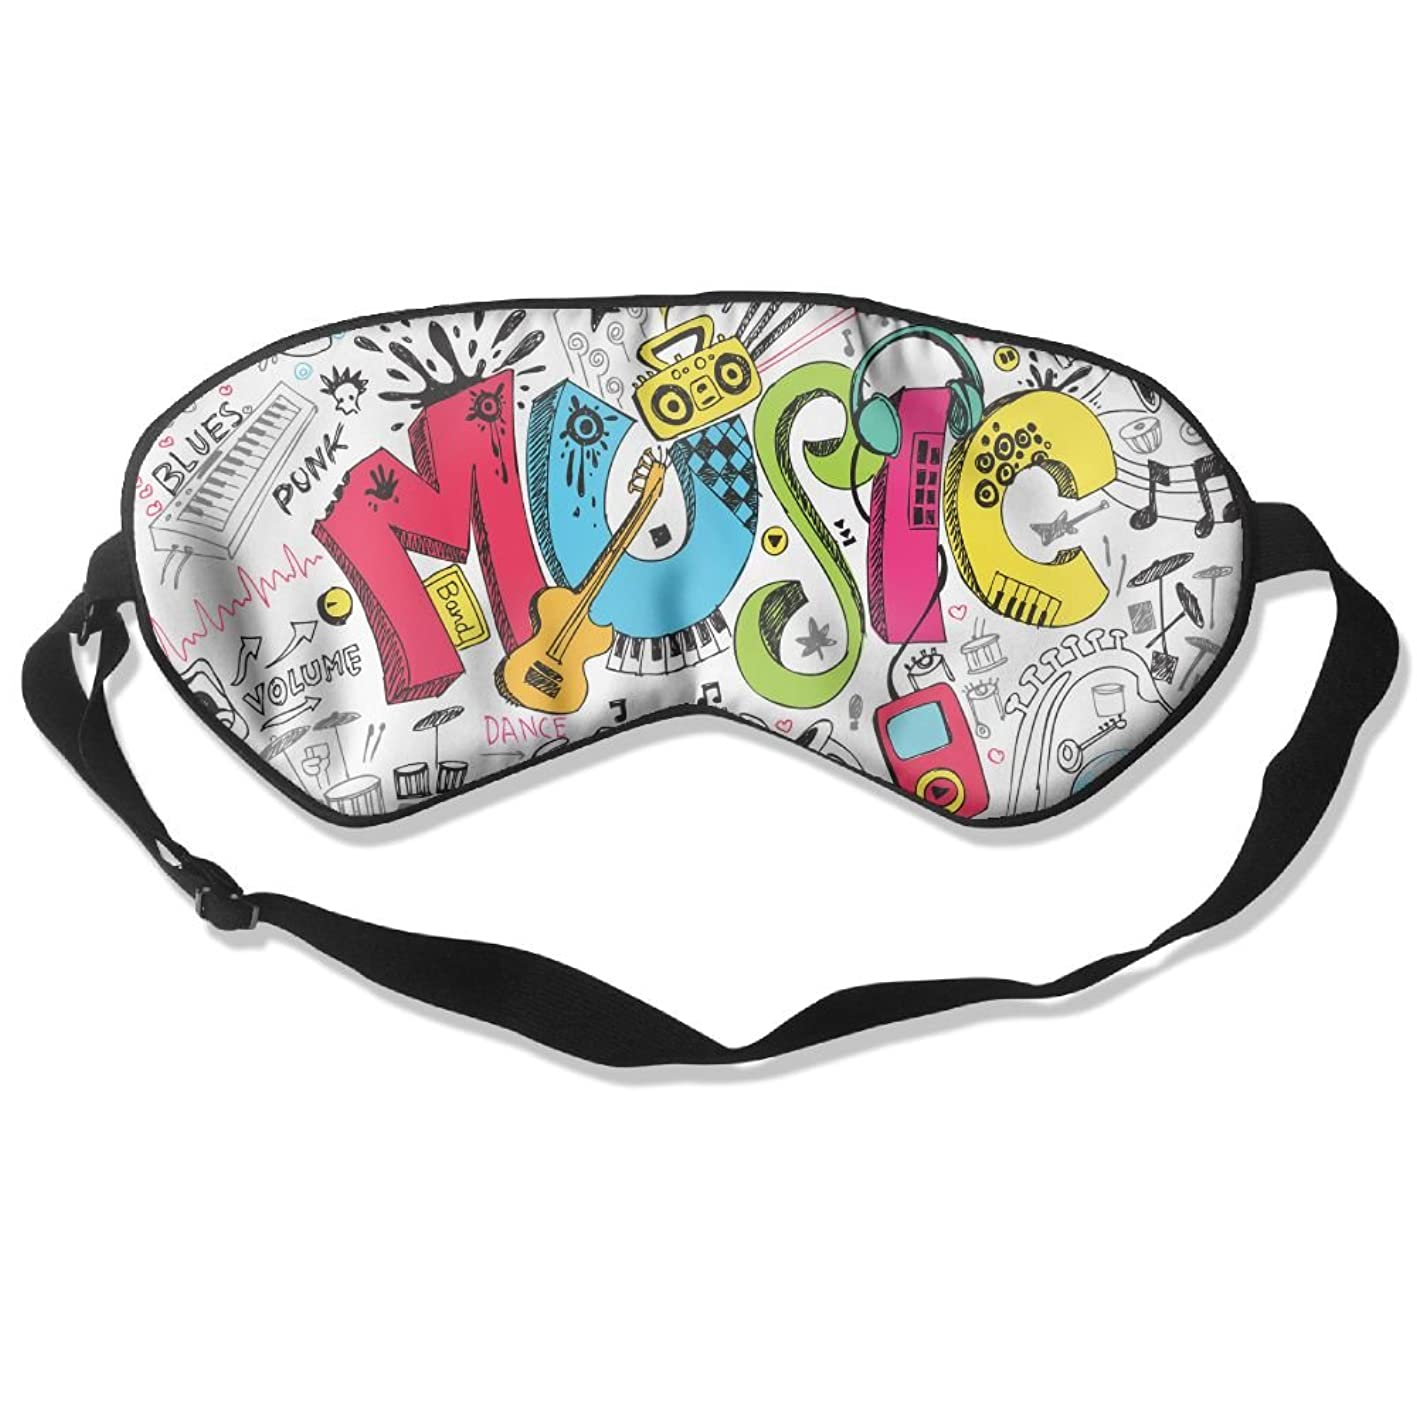 Sleep Mask Music Eye Cover Blackout Eye Masks,Soothing Puffy Eyes,Dark Circles,Stress,Breathable Blindfold for Women Men ulixodwjjxu721